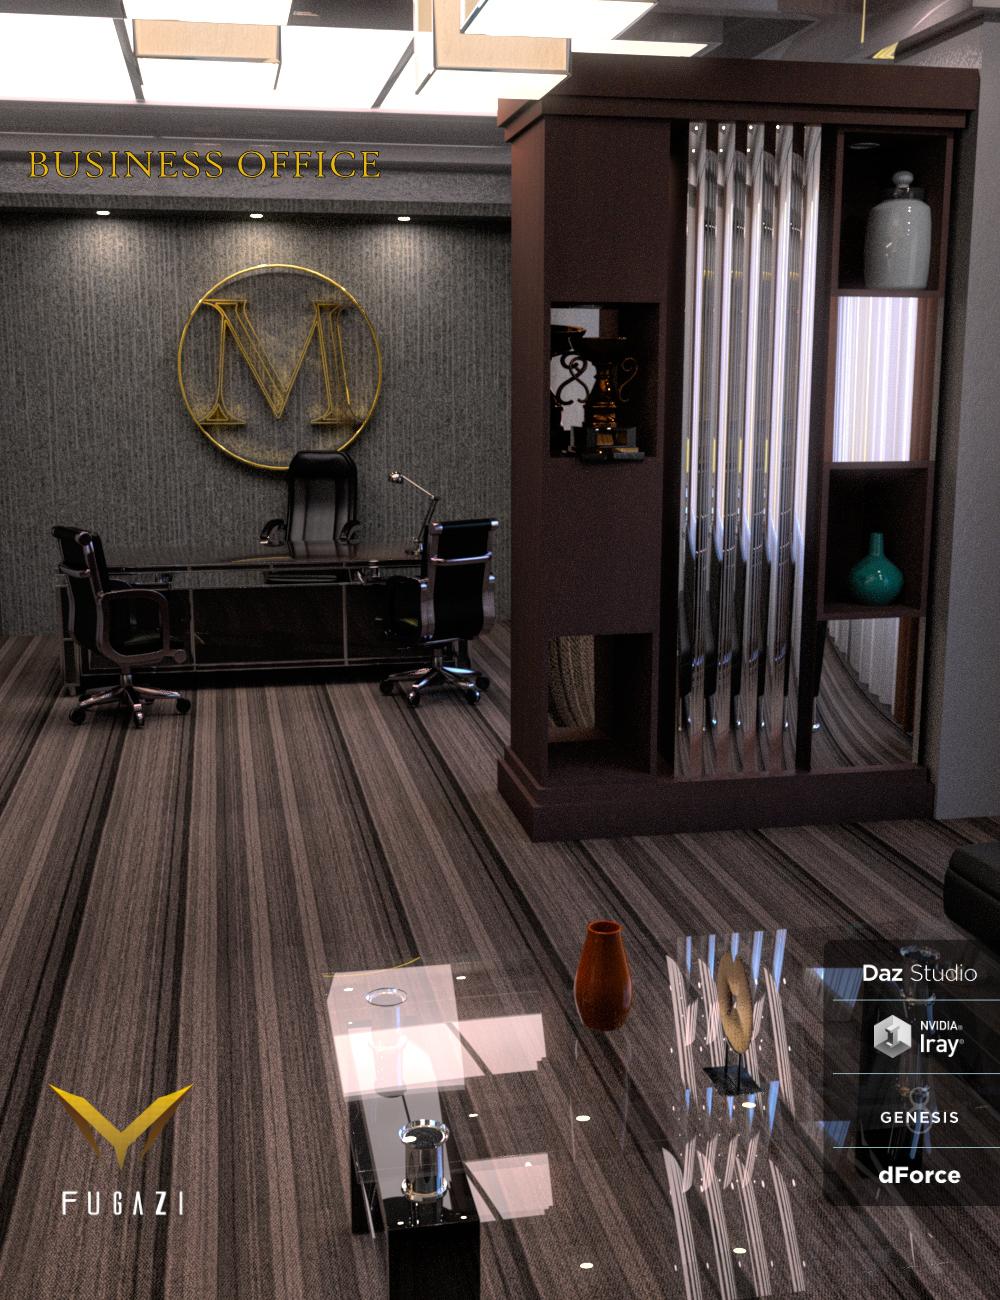 FG Business Office by: Fugazi1968, 3D Models by Daz 3D